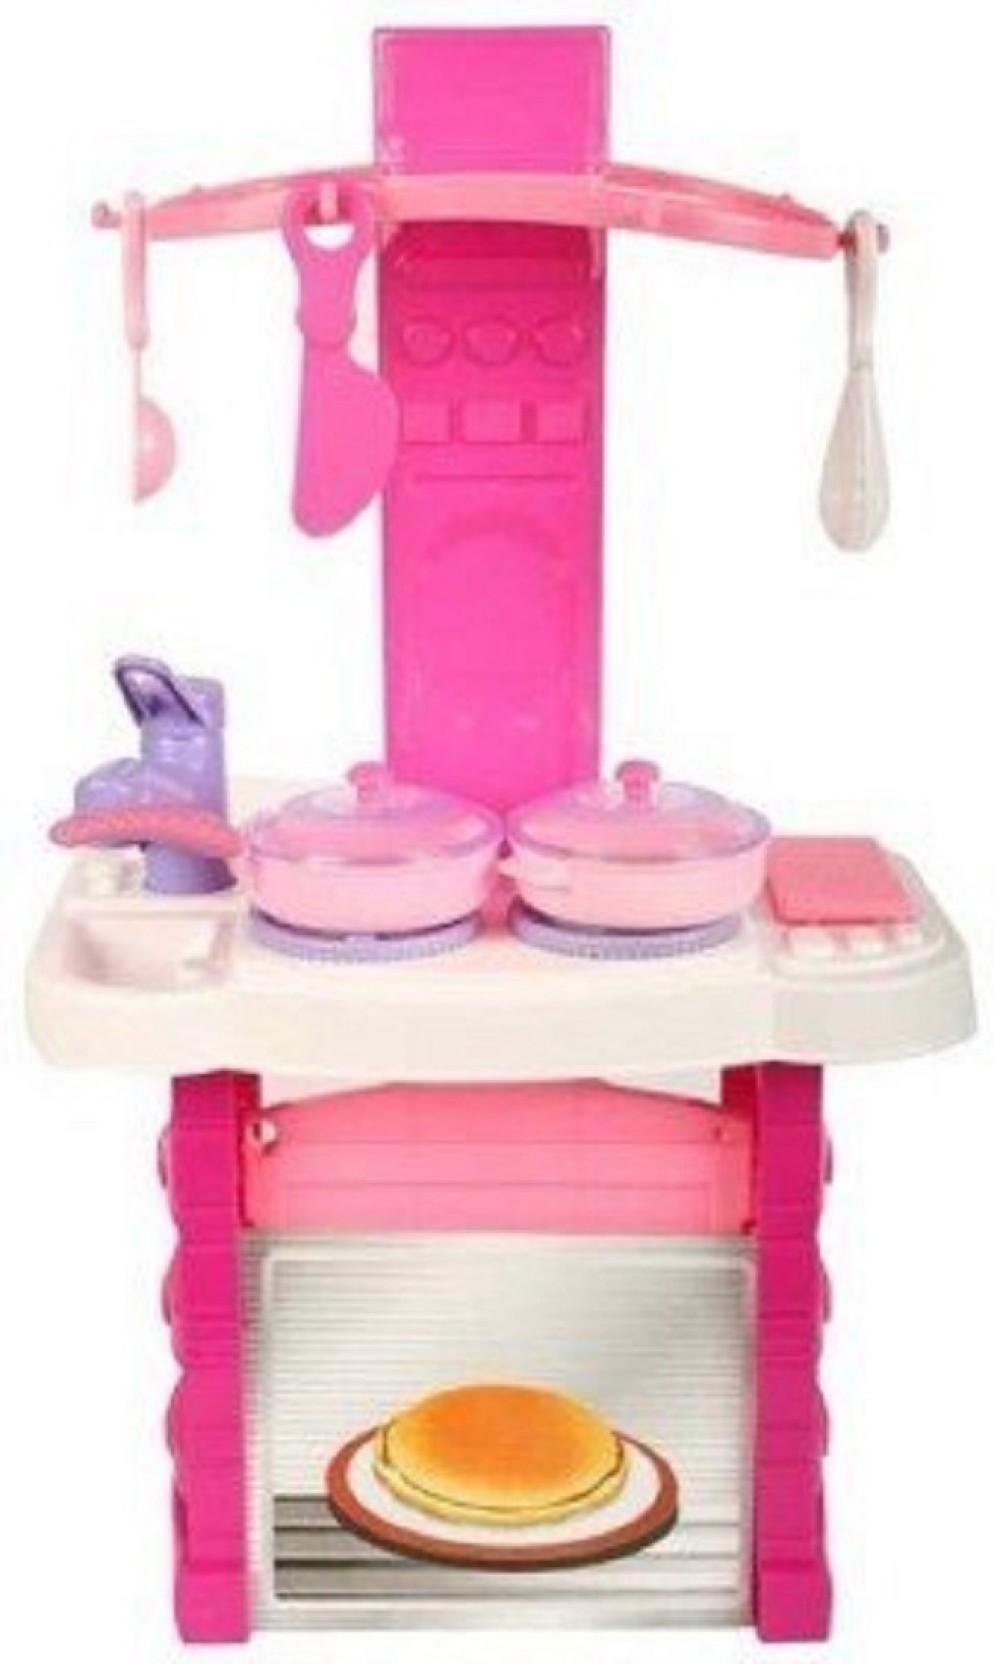 My unique hub mini kitchen set for kids add to cart